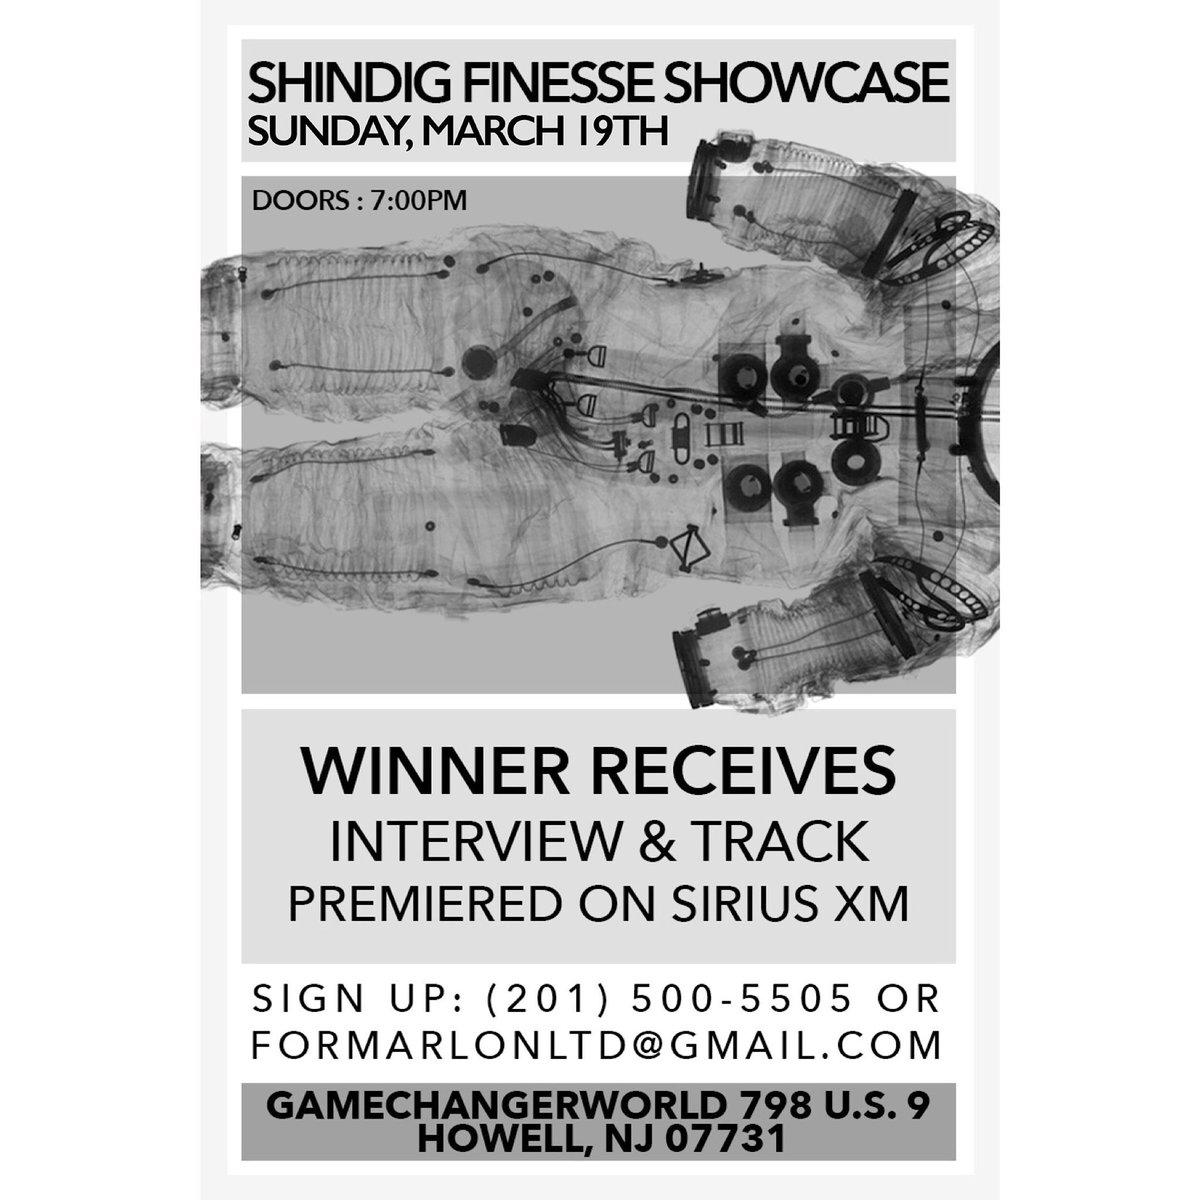 "... Finess showcase comes to #GameChangerWorld Sunday 3-9 Winner receive interview/Track on Sirius Xm!! Contact 201-500-5505 https://t.co/k5JmOsRliq"""